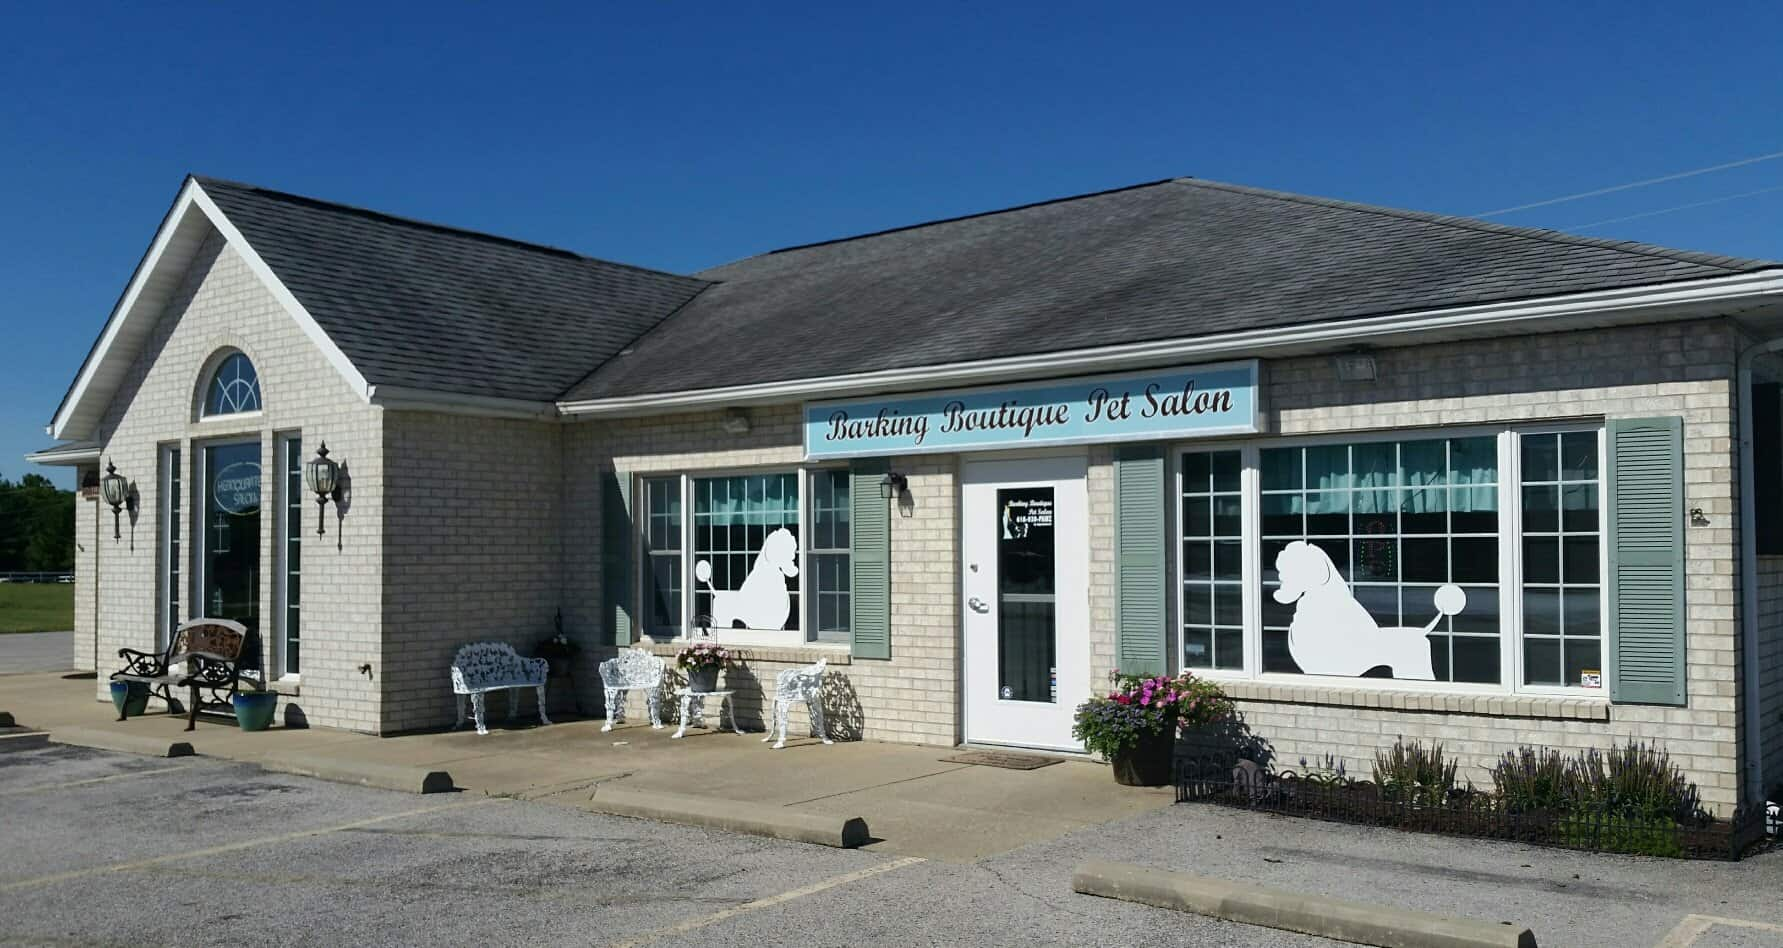 Barking Boutique Pet Salon Waterloo, Il